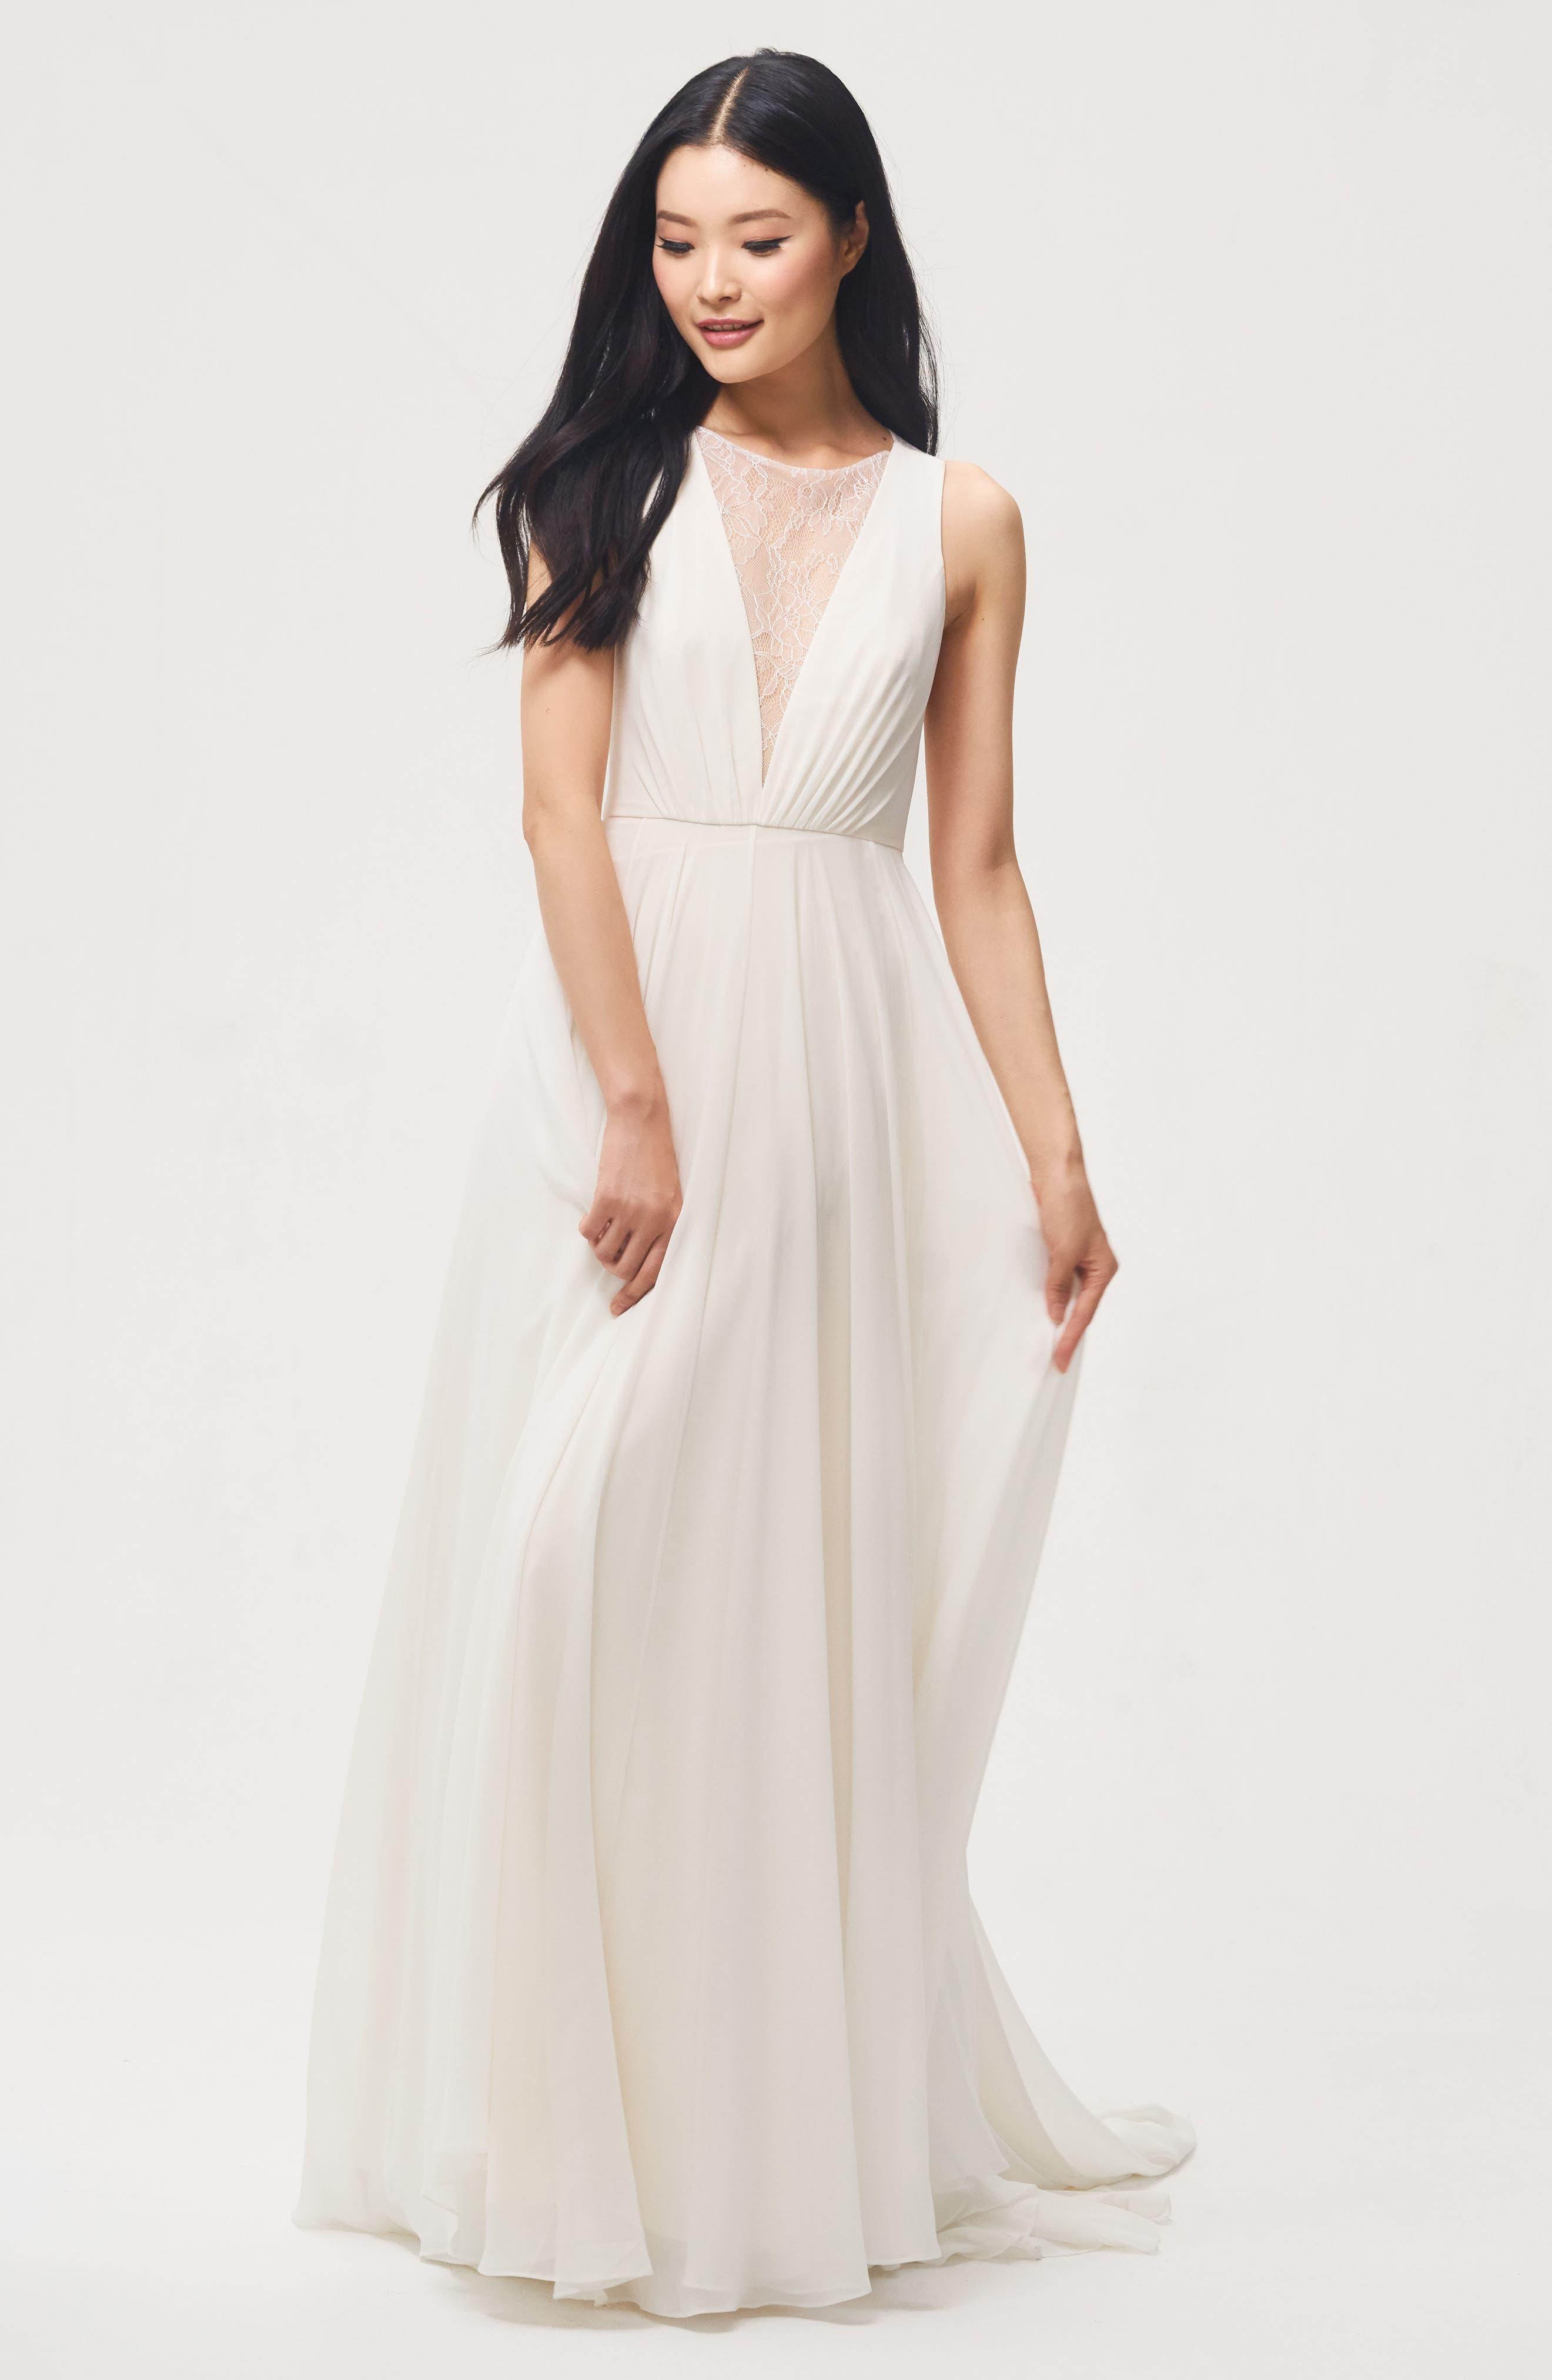 Minimalist Wedding Dresses Bridal Gowns Nordstrom